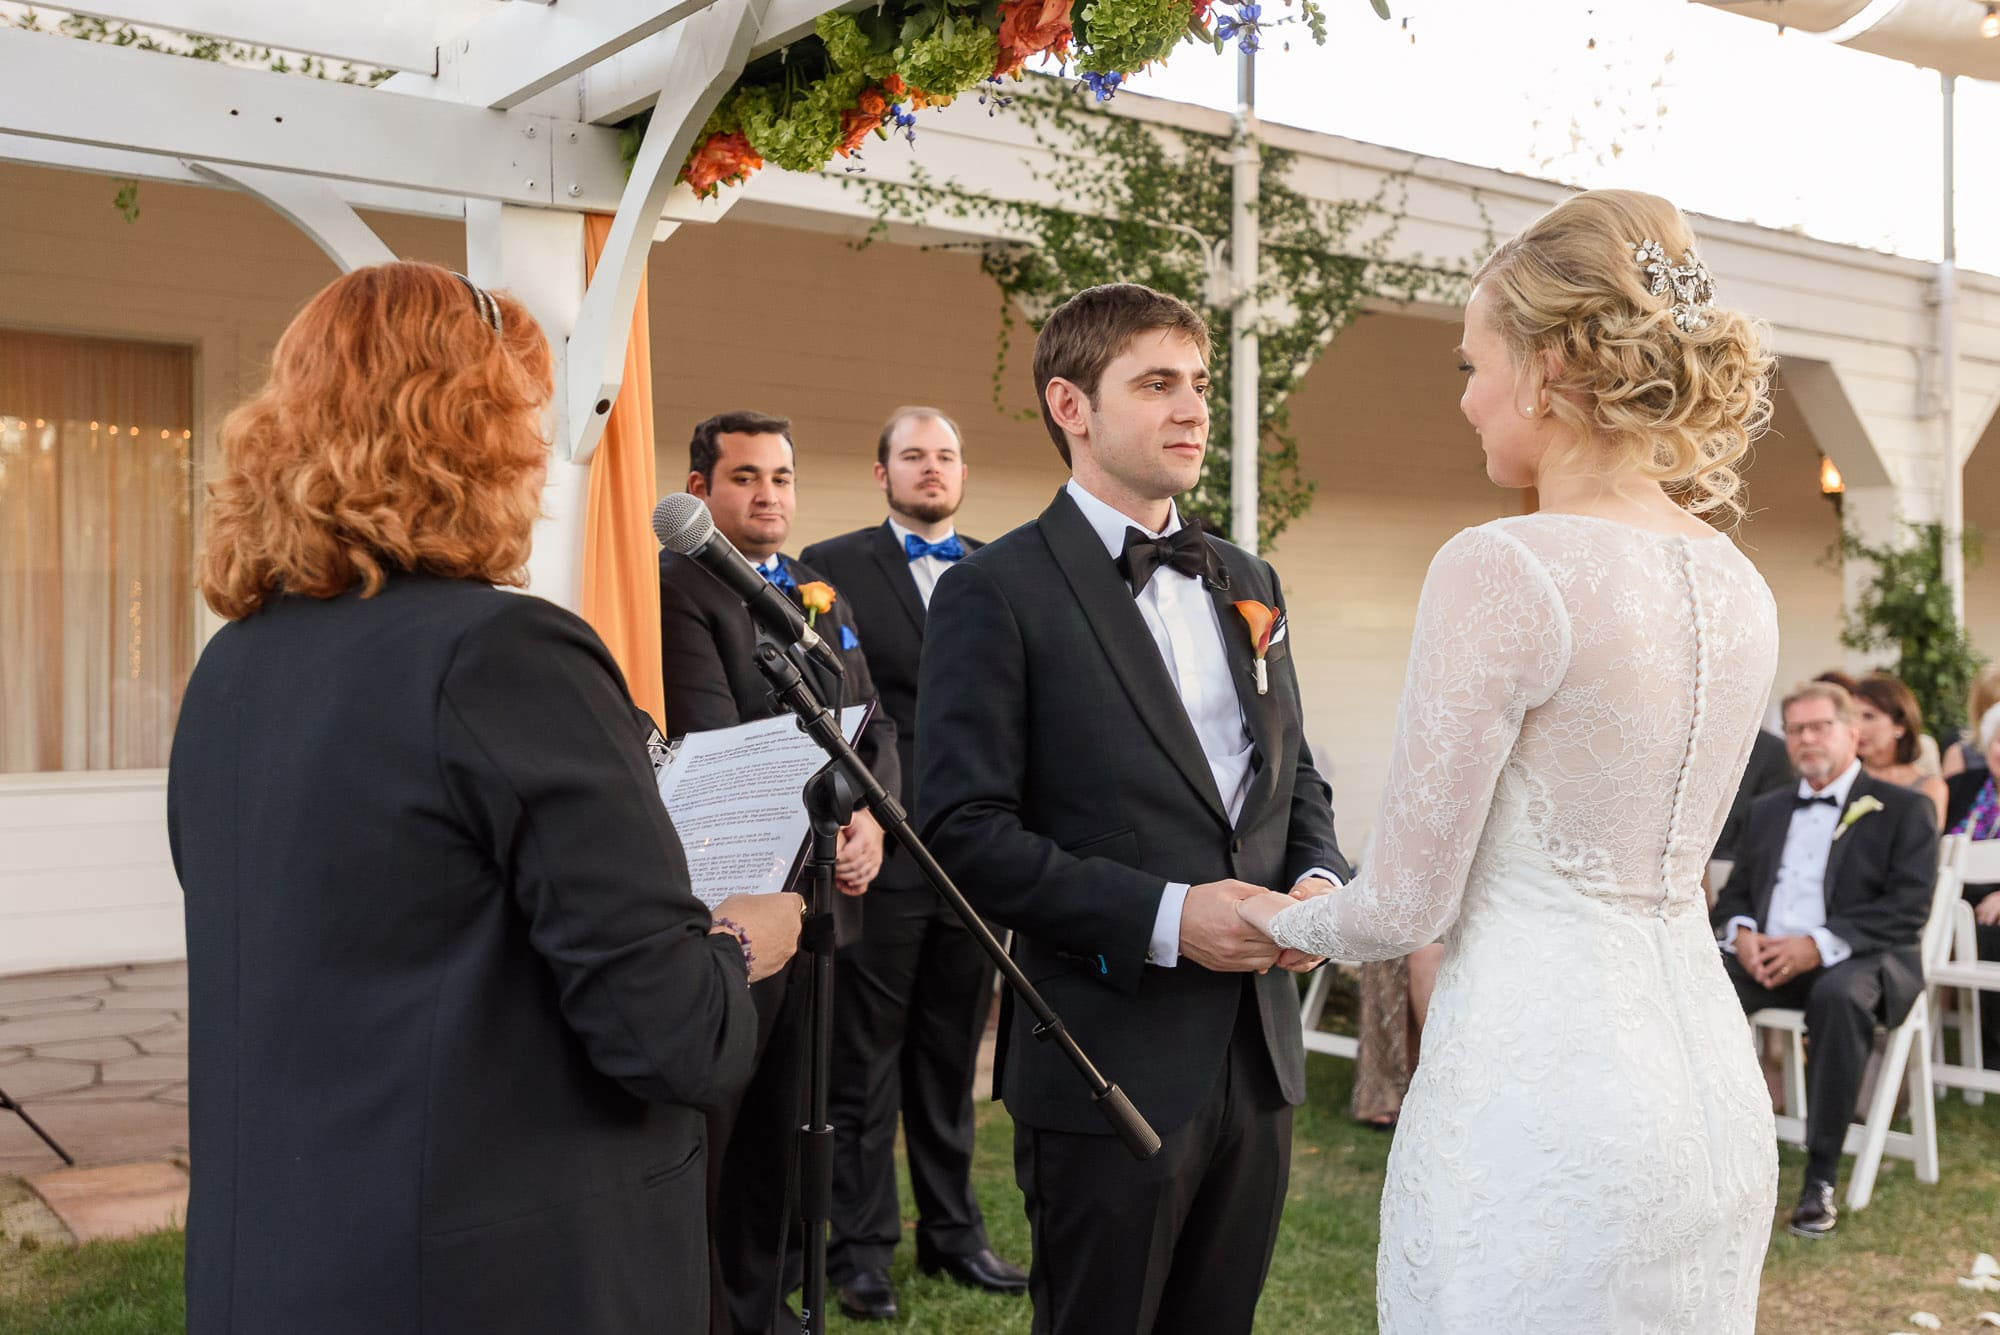 042_Alan_and_Heidi_Los_Angeles_Equestrian_Center_Wedding